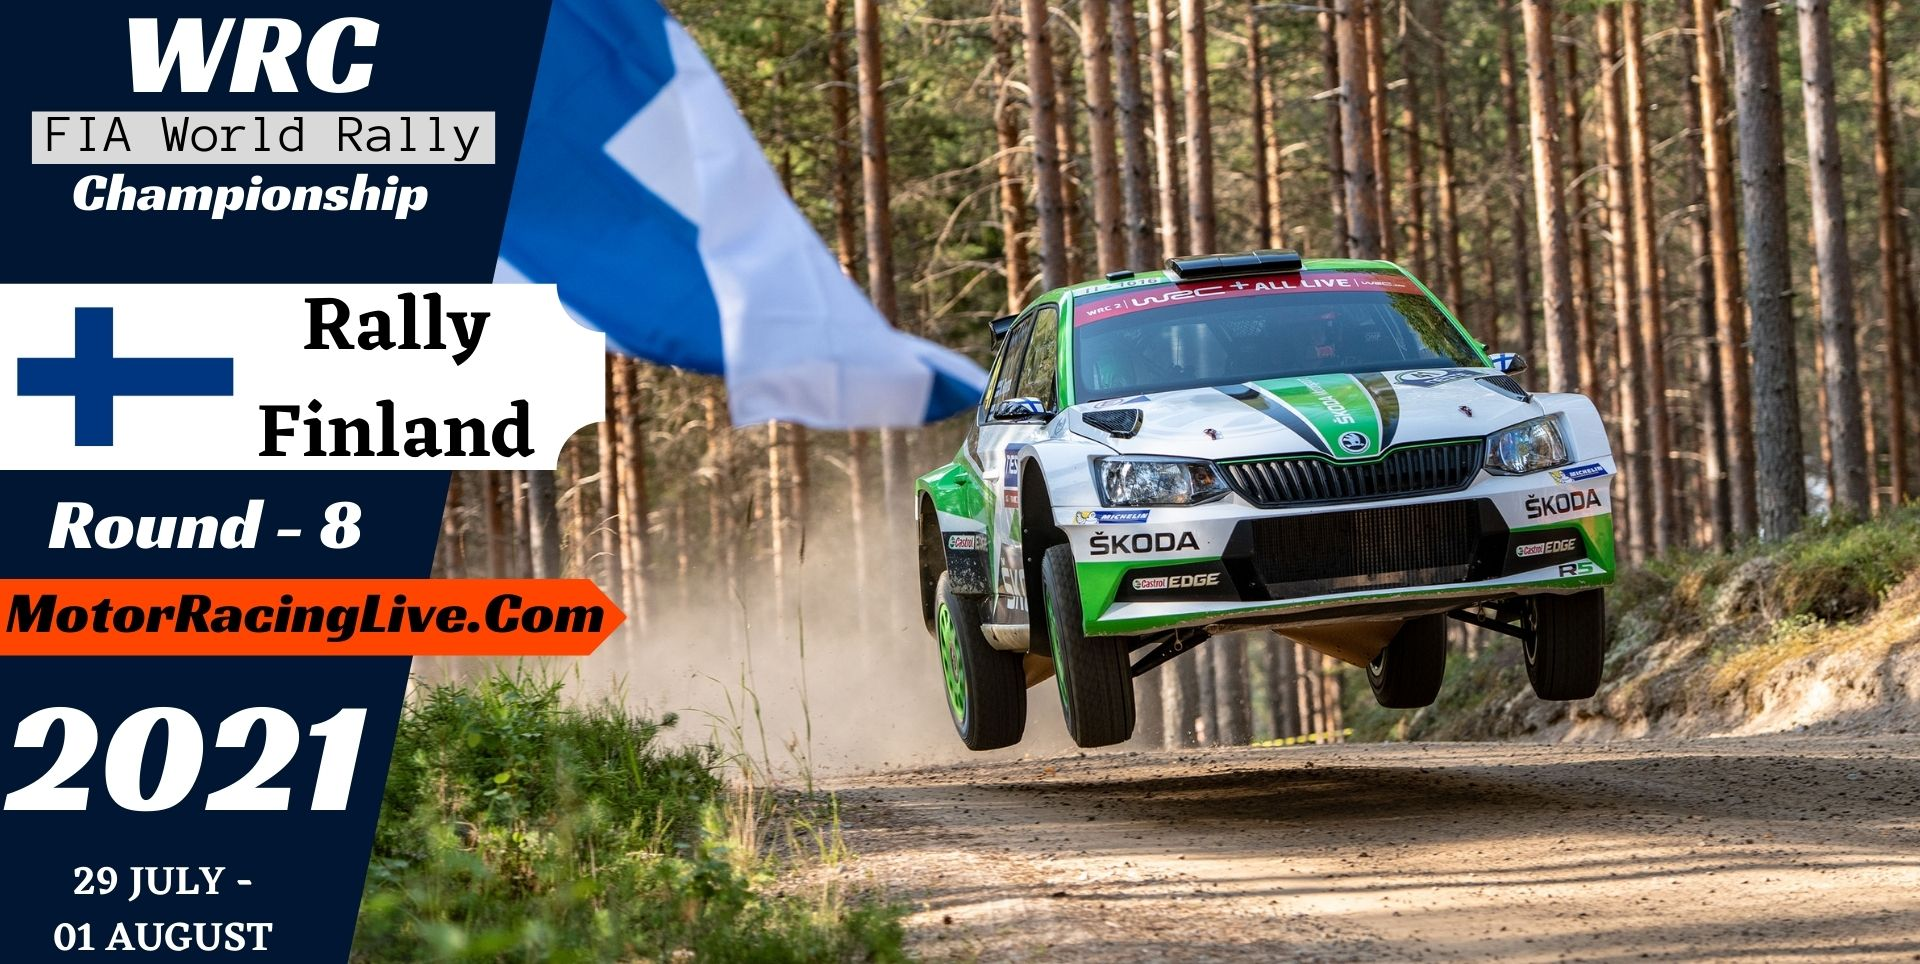 WRC Rally Finland Round 8 Live Stream 2021